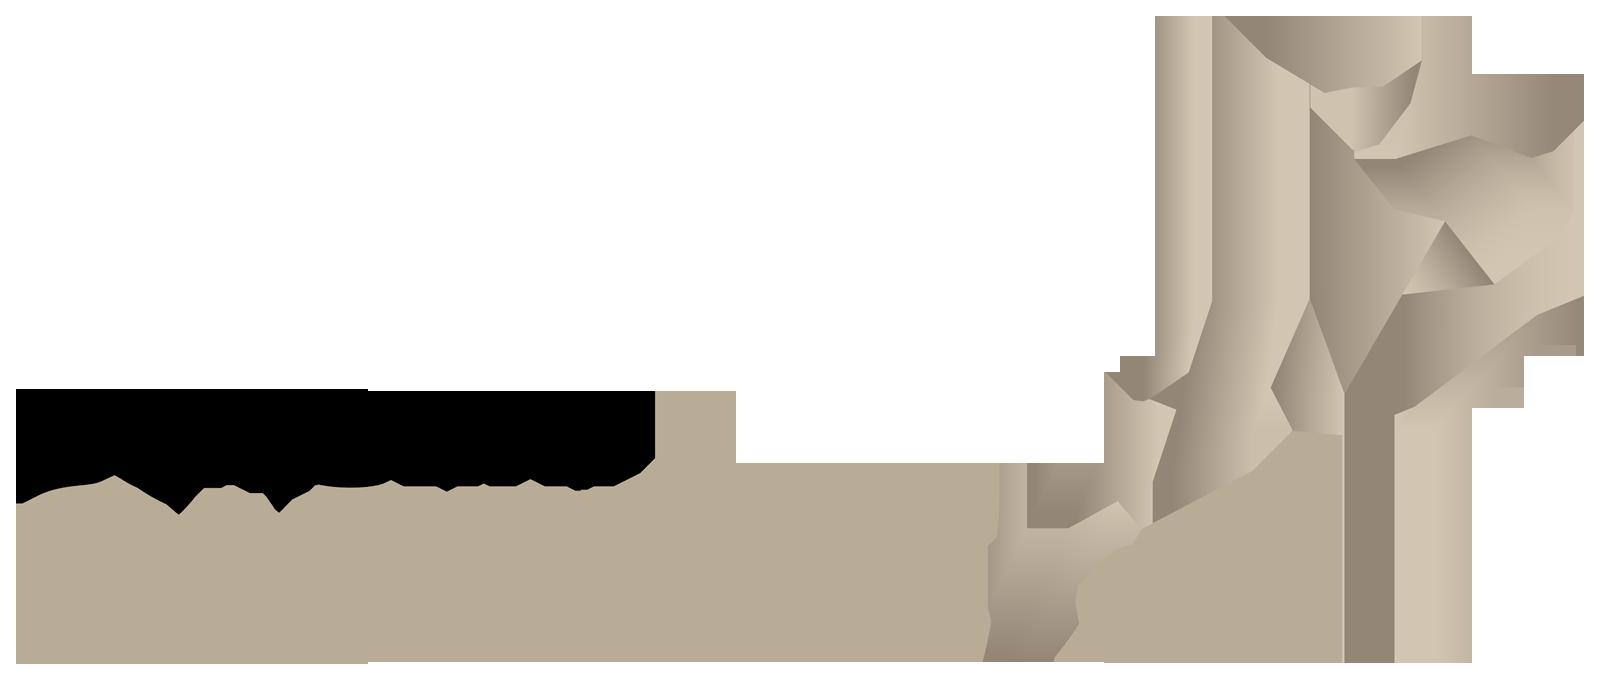 Gazelle-2017_rgb_transparent